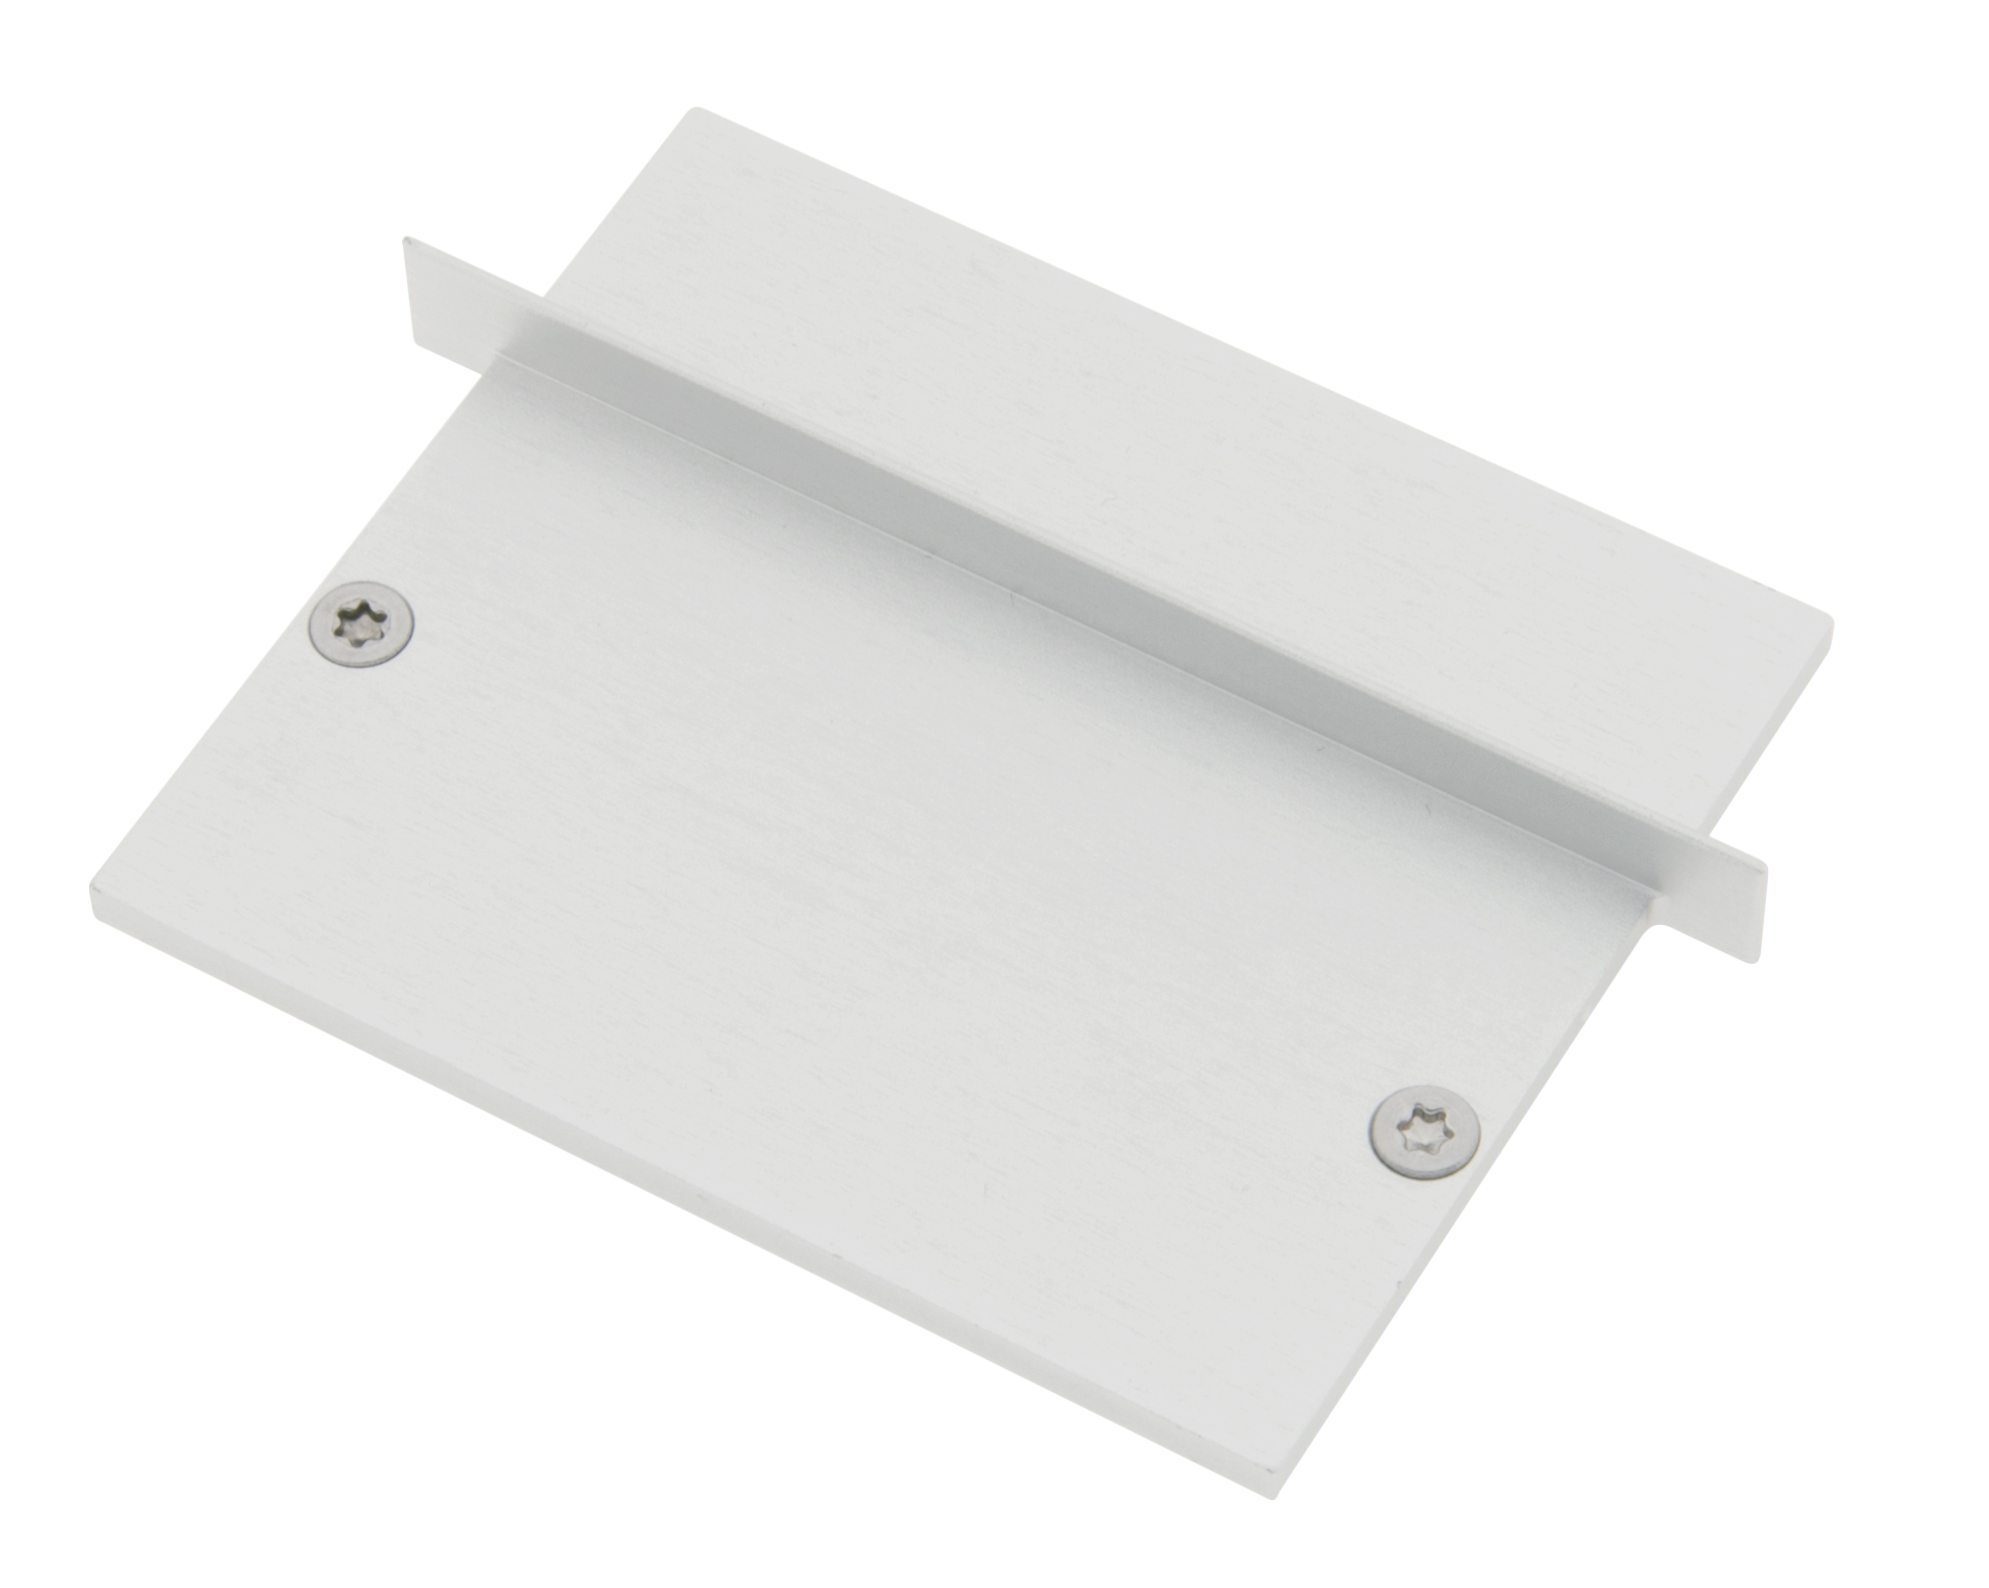 1 Stk Profil Endkappe SLI Eckig geschlossen inkl. Schrauben LIEK003320